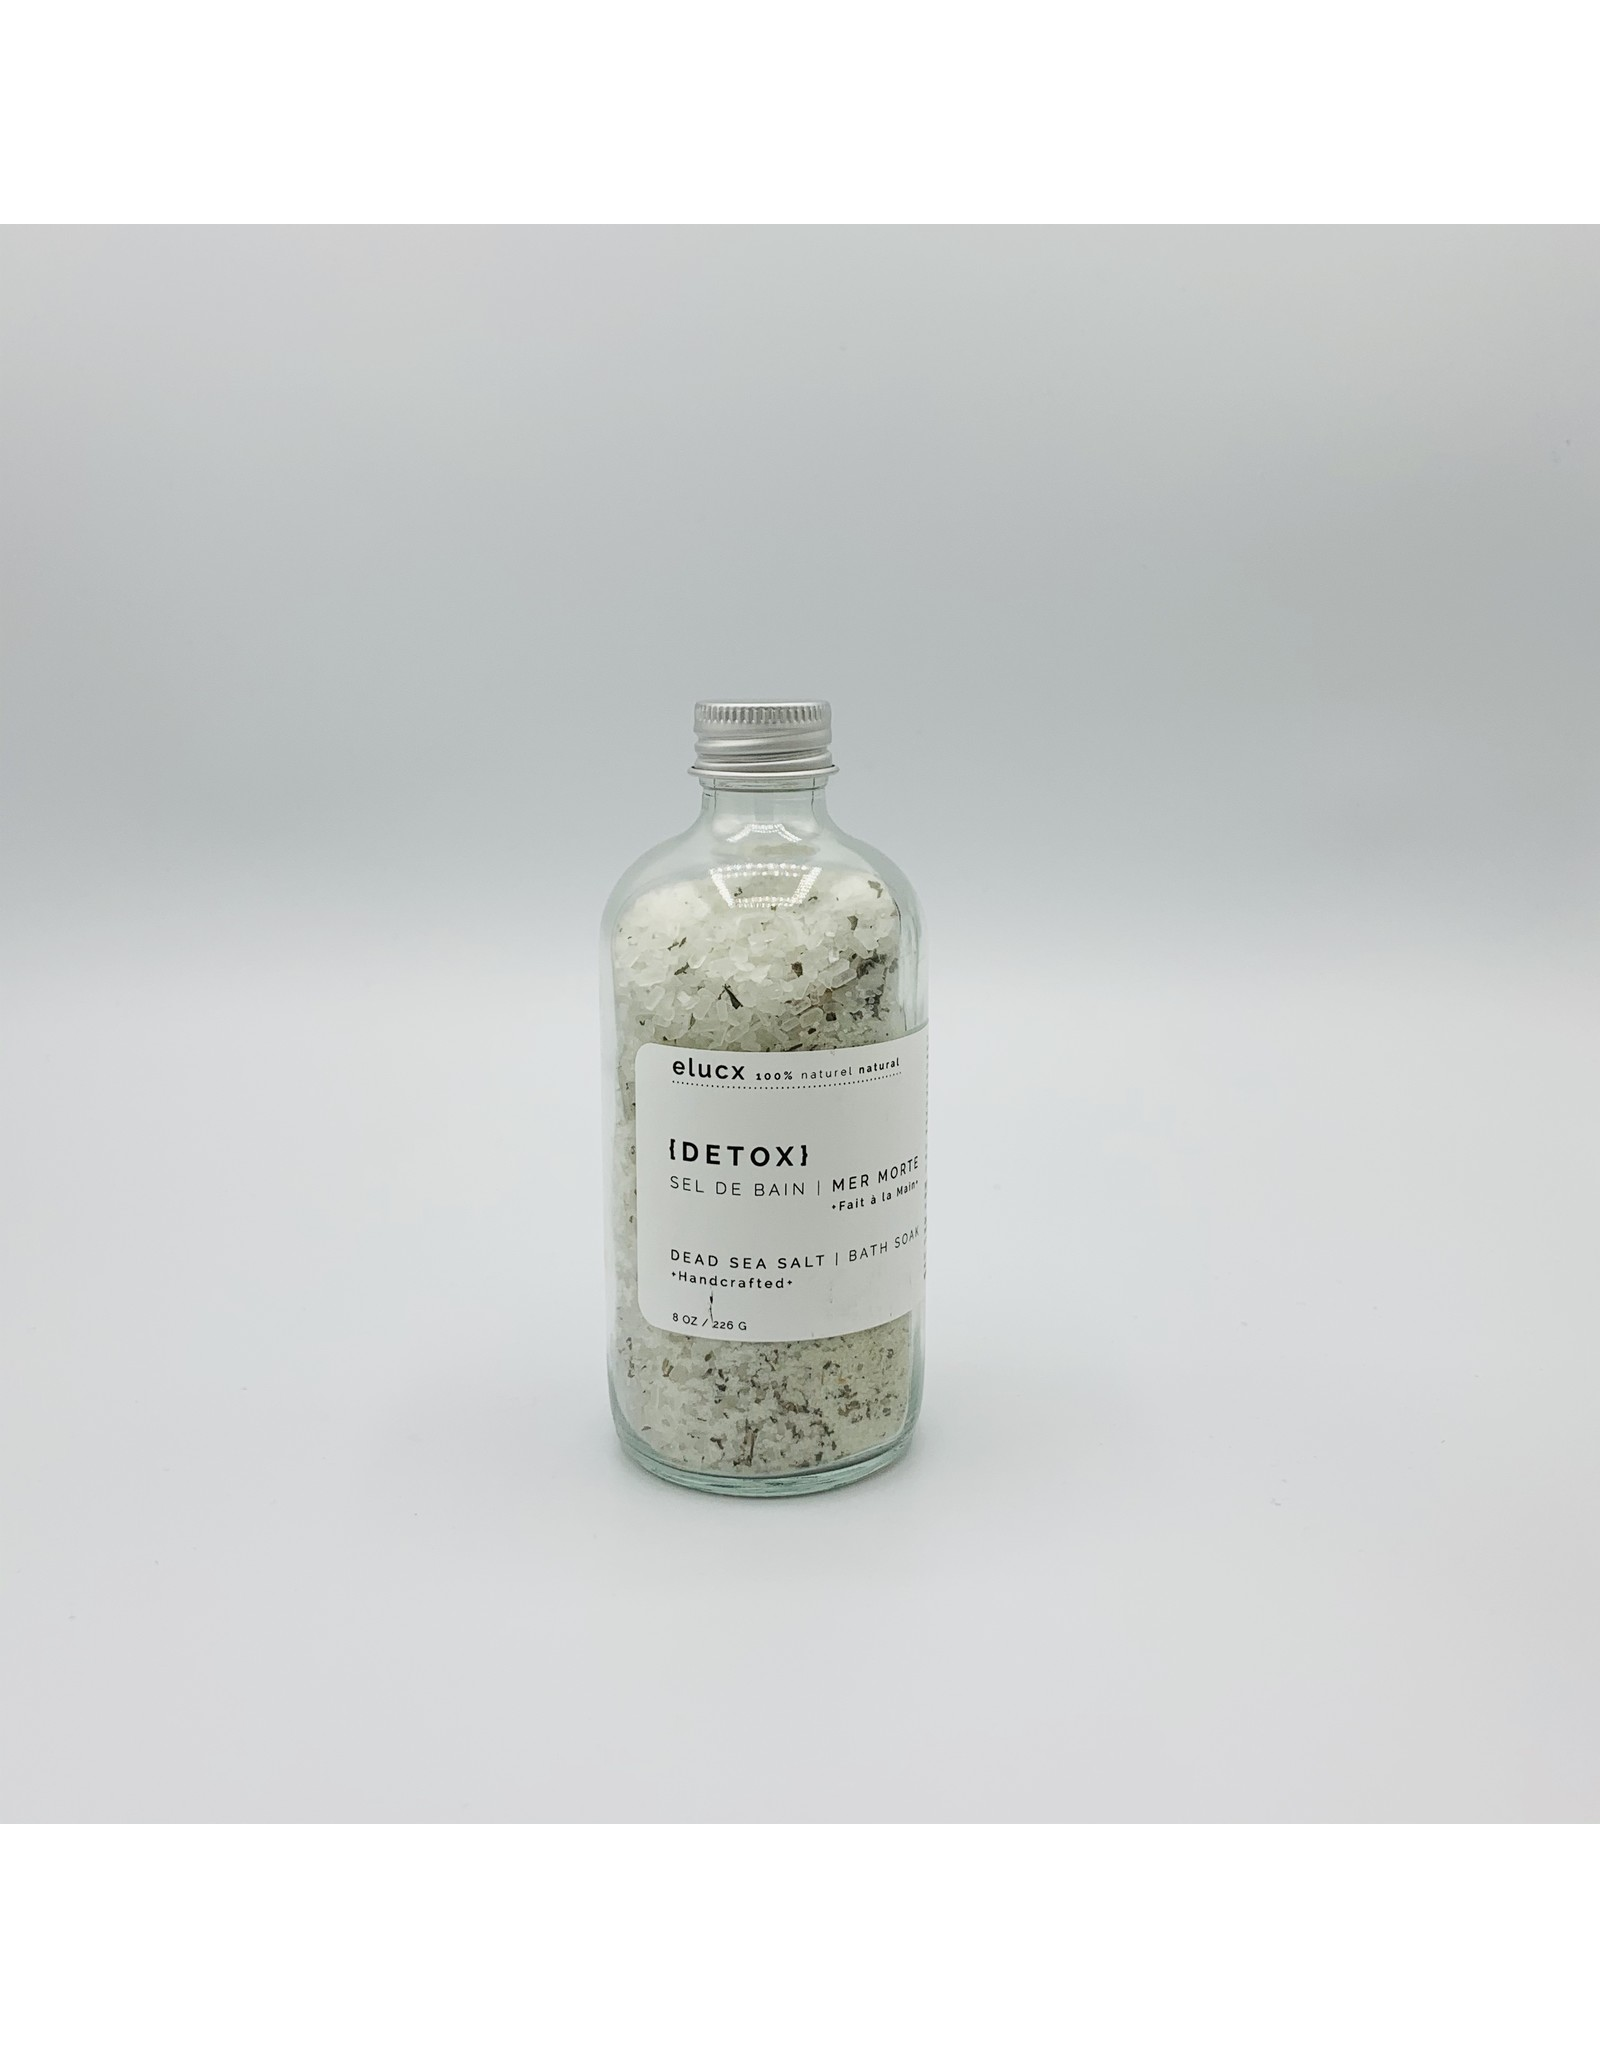 Elucx Dead Sea Bath Salt